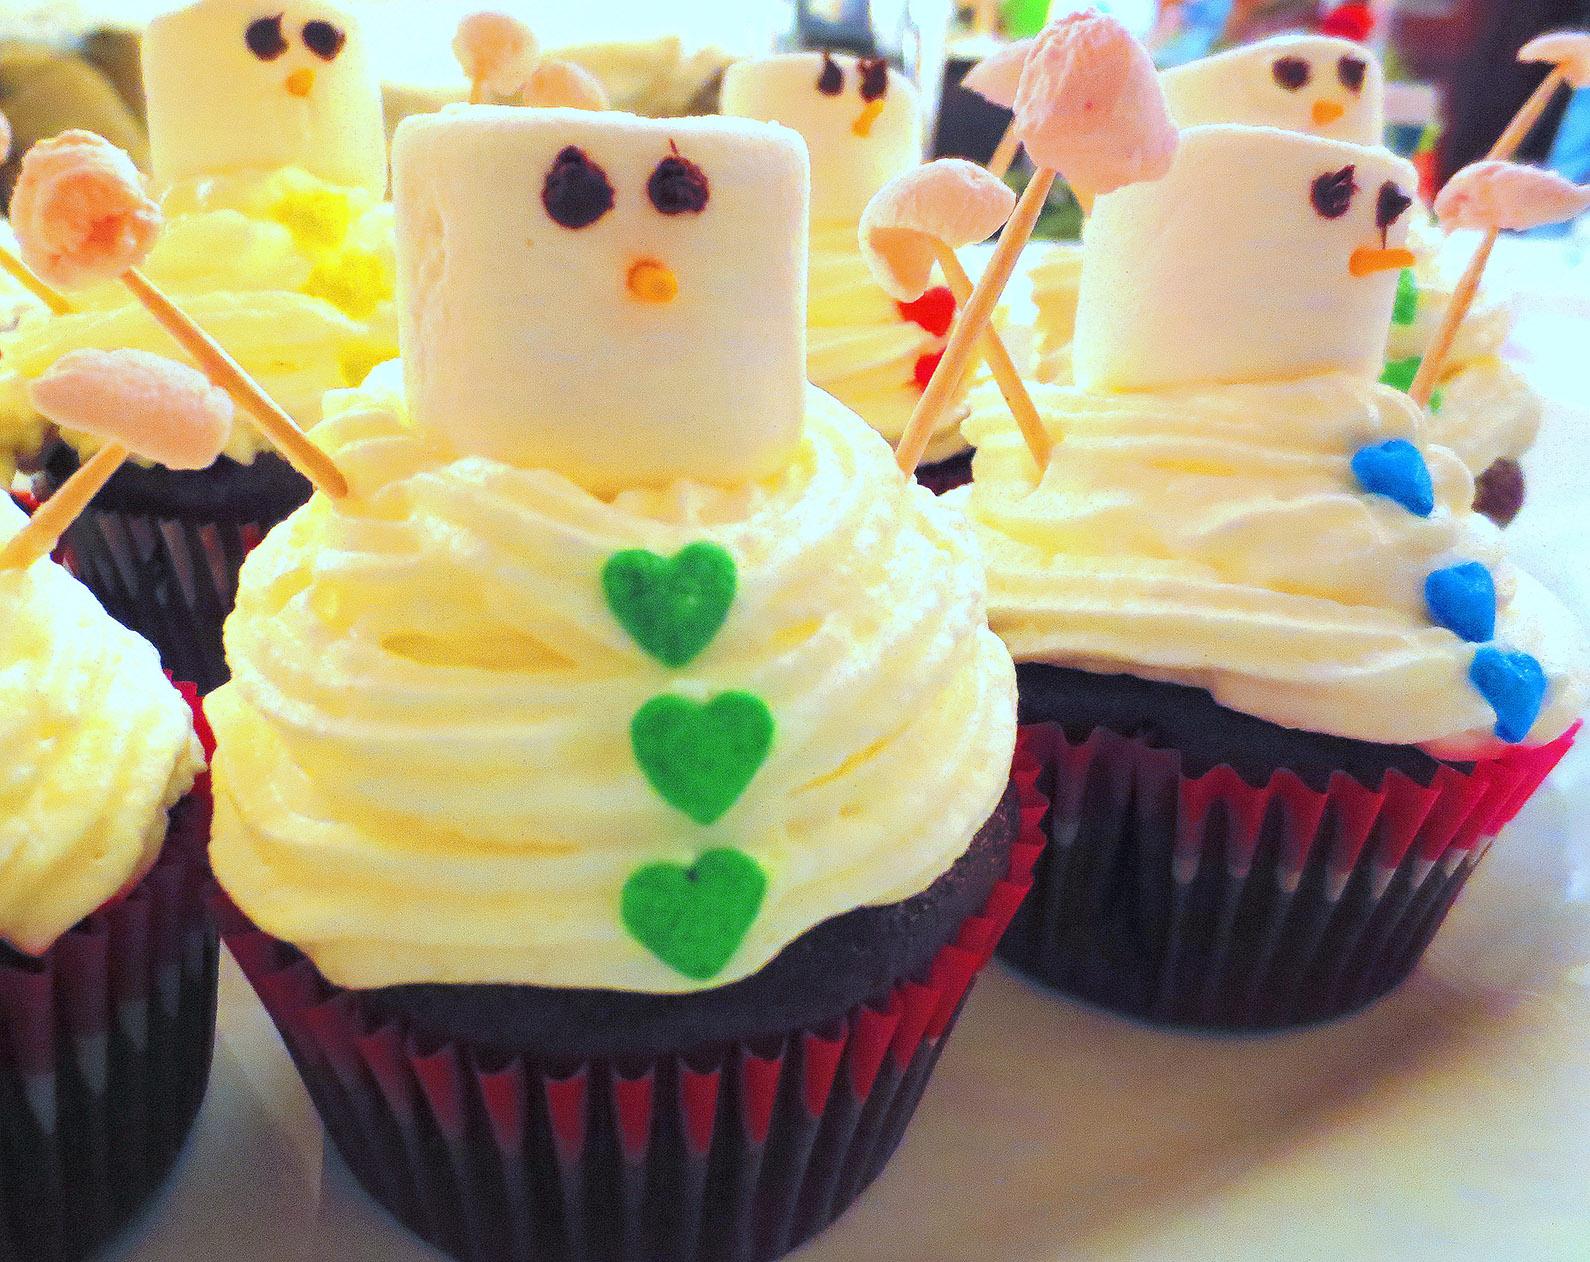 Cupcakes Todo Chocolate Y Munecos De Nieve Je Cuisine Donc Je Suis